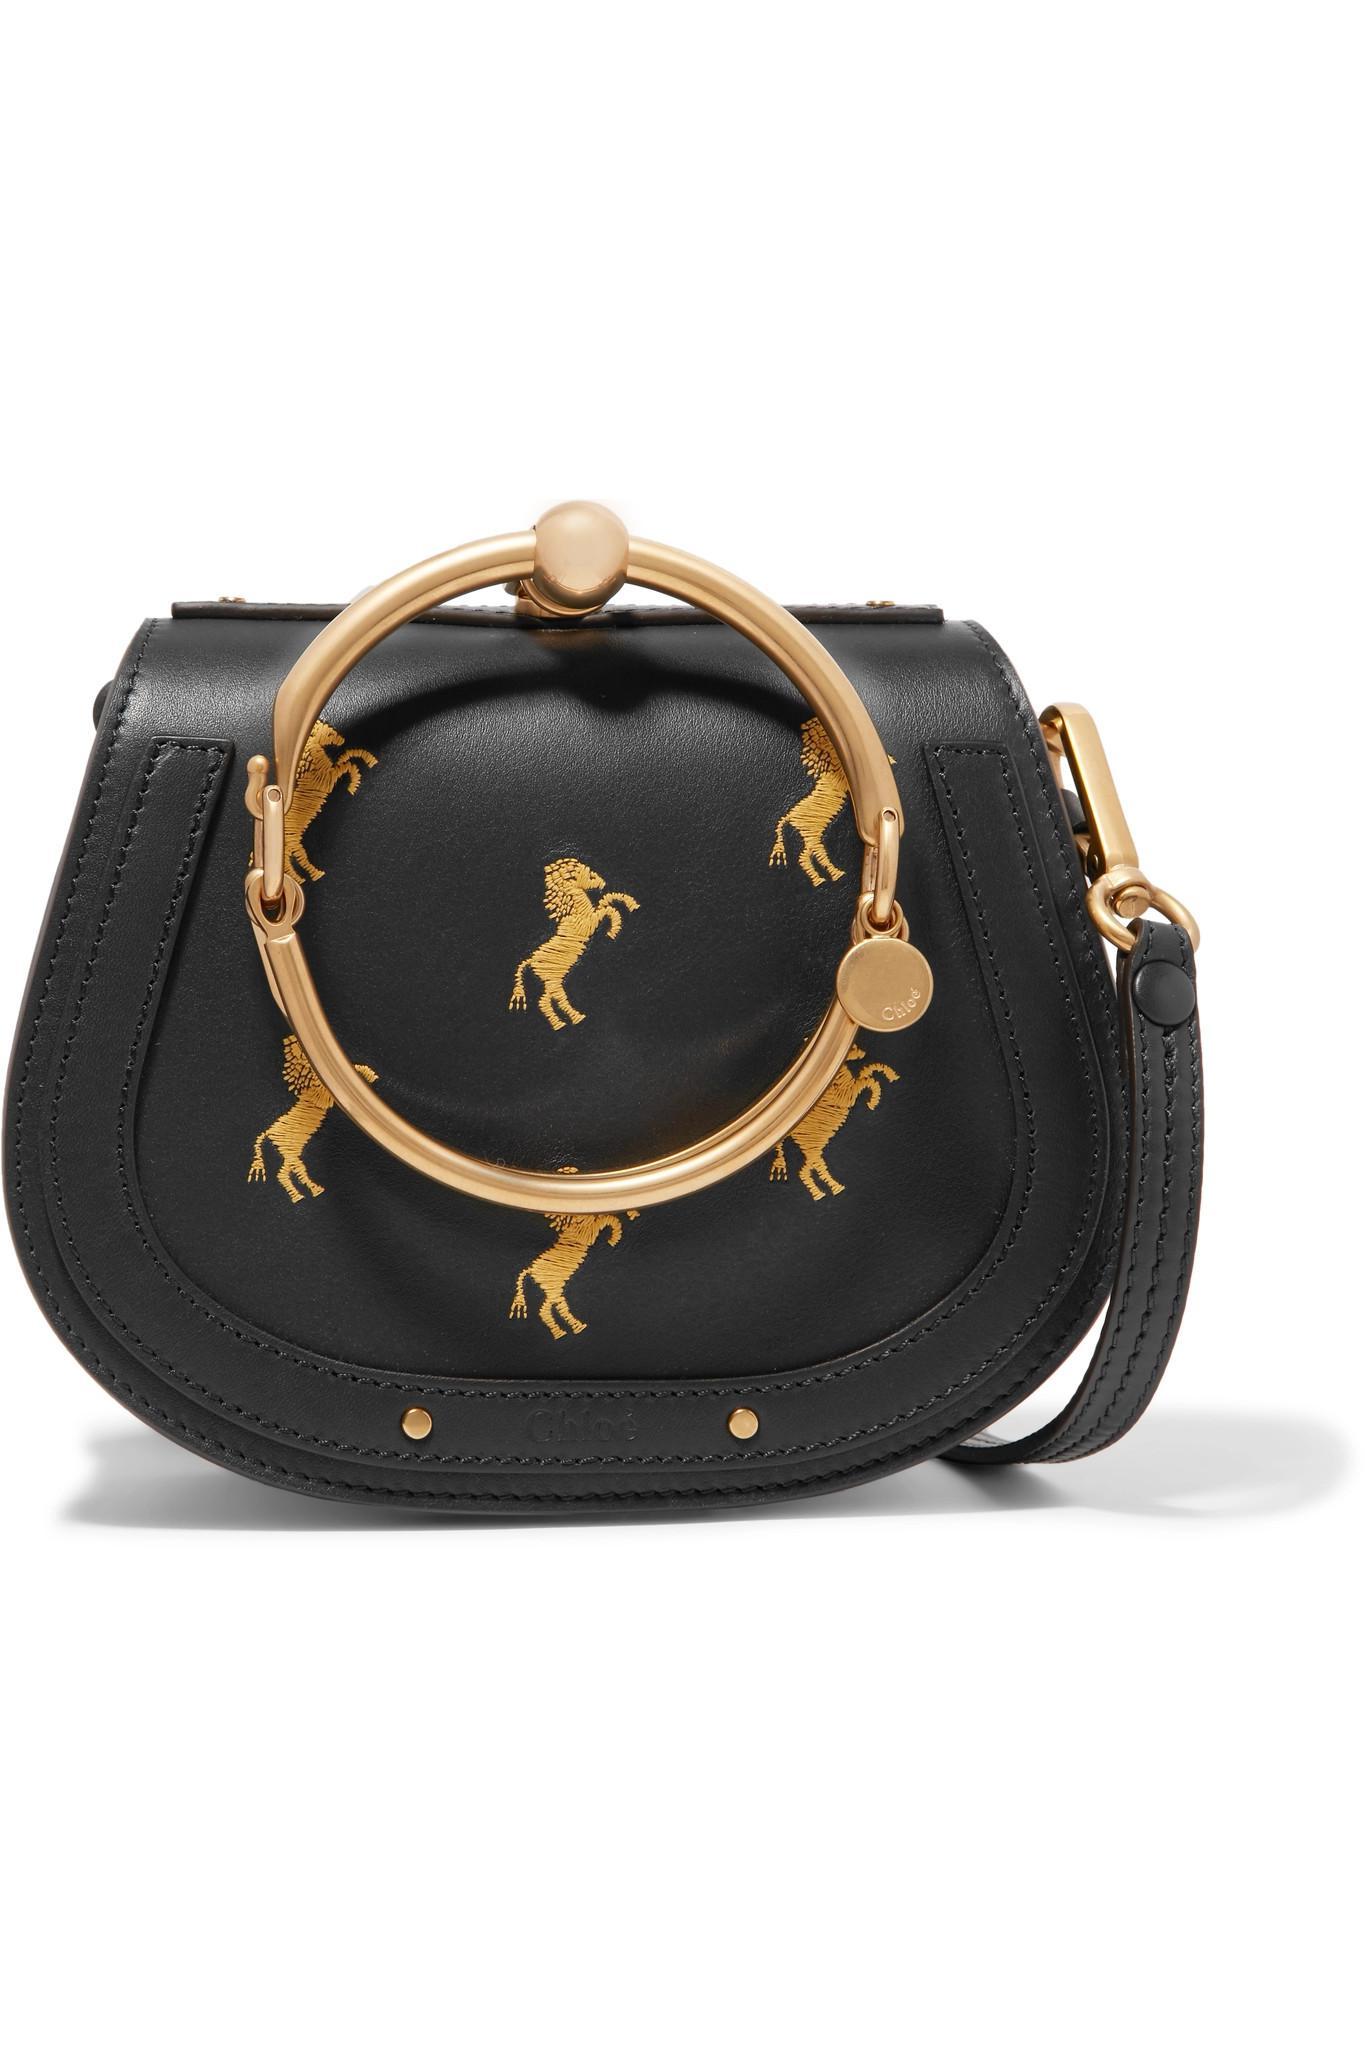 Nile Bracelet Small Embroidered Leather And Suede Shoulder Bag - Navy Chlo 5jfhPJCz